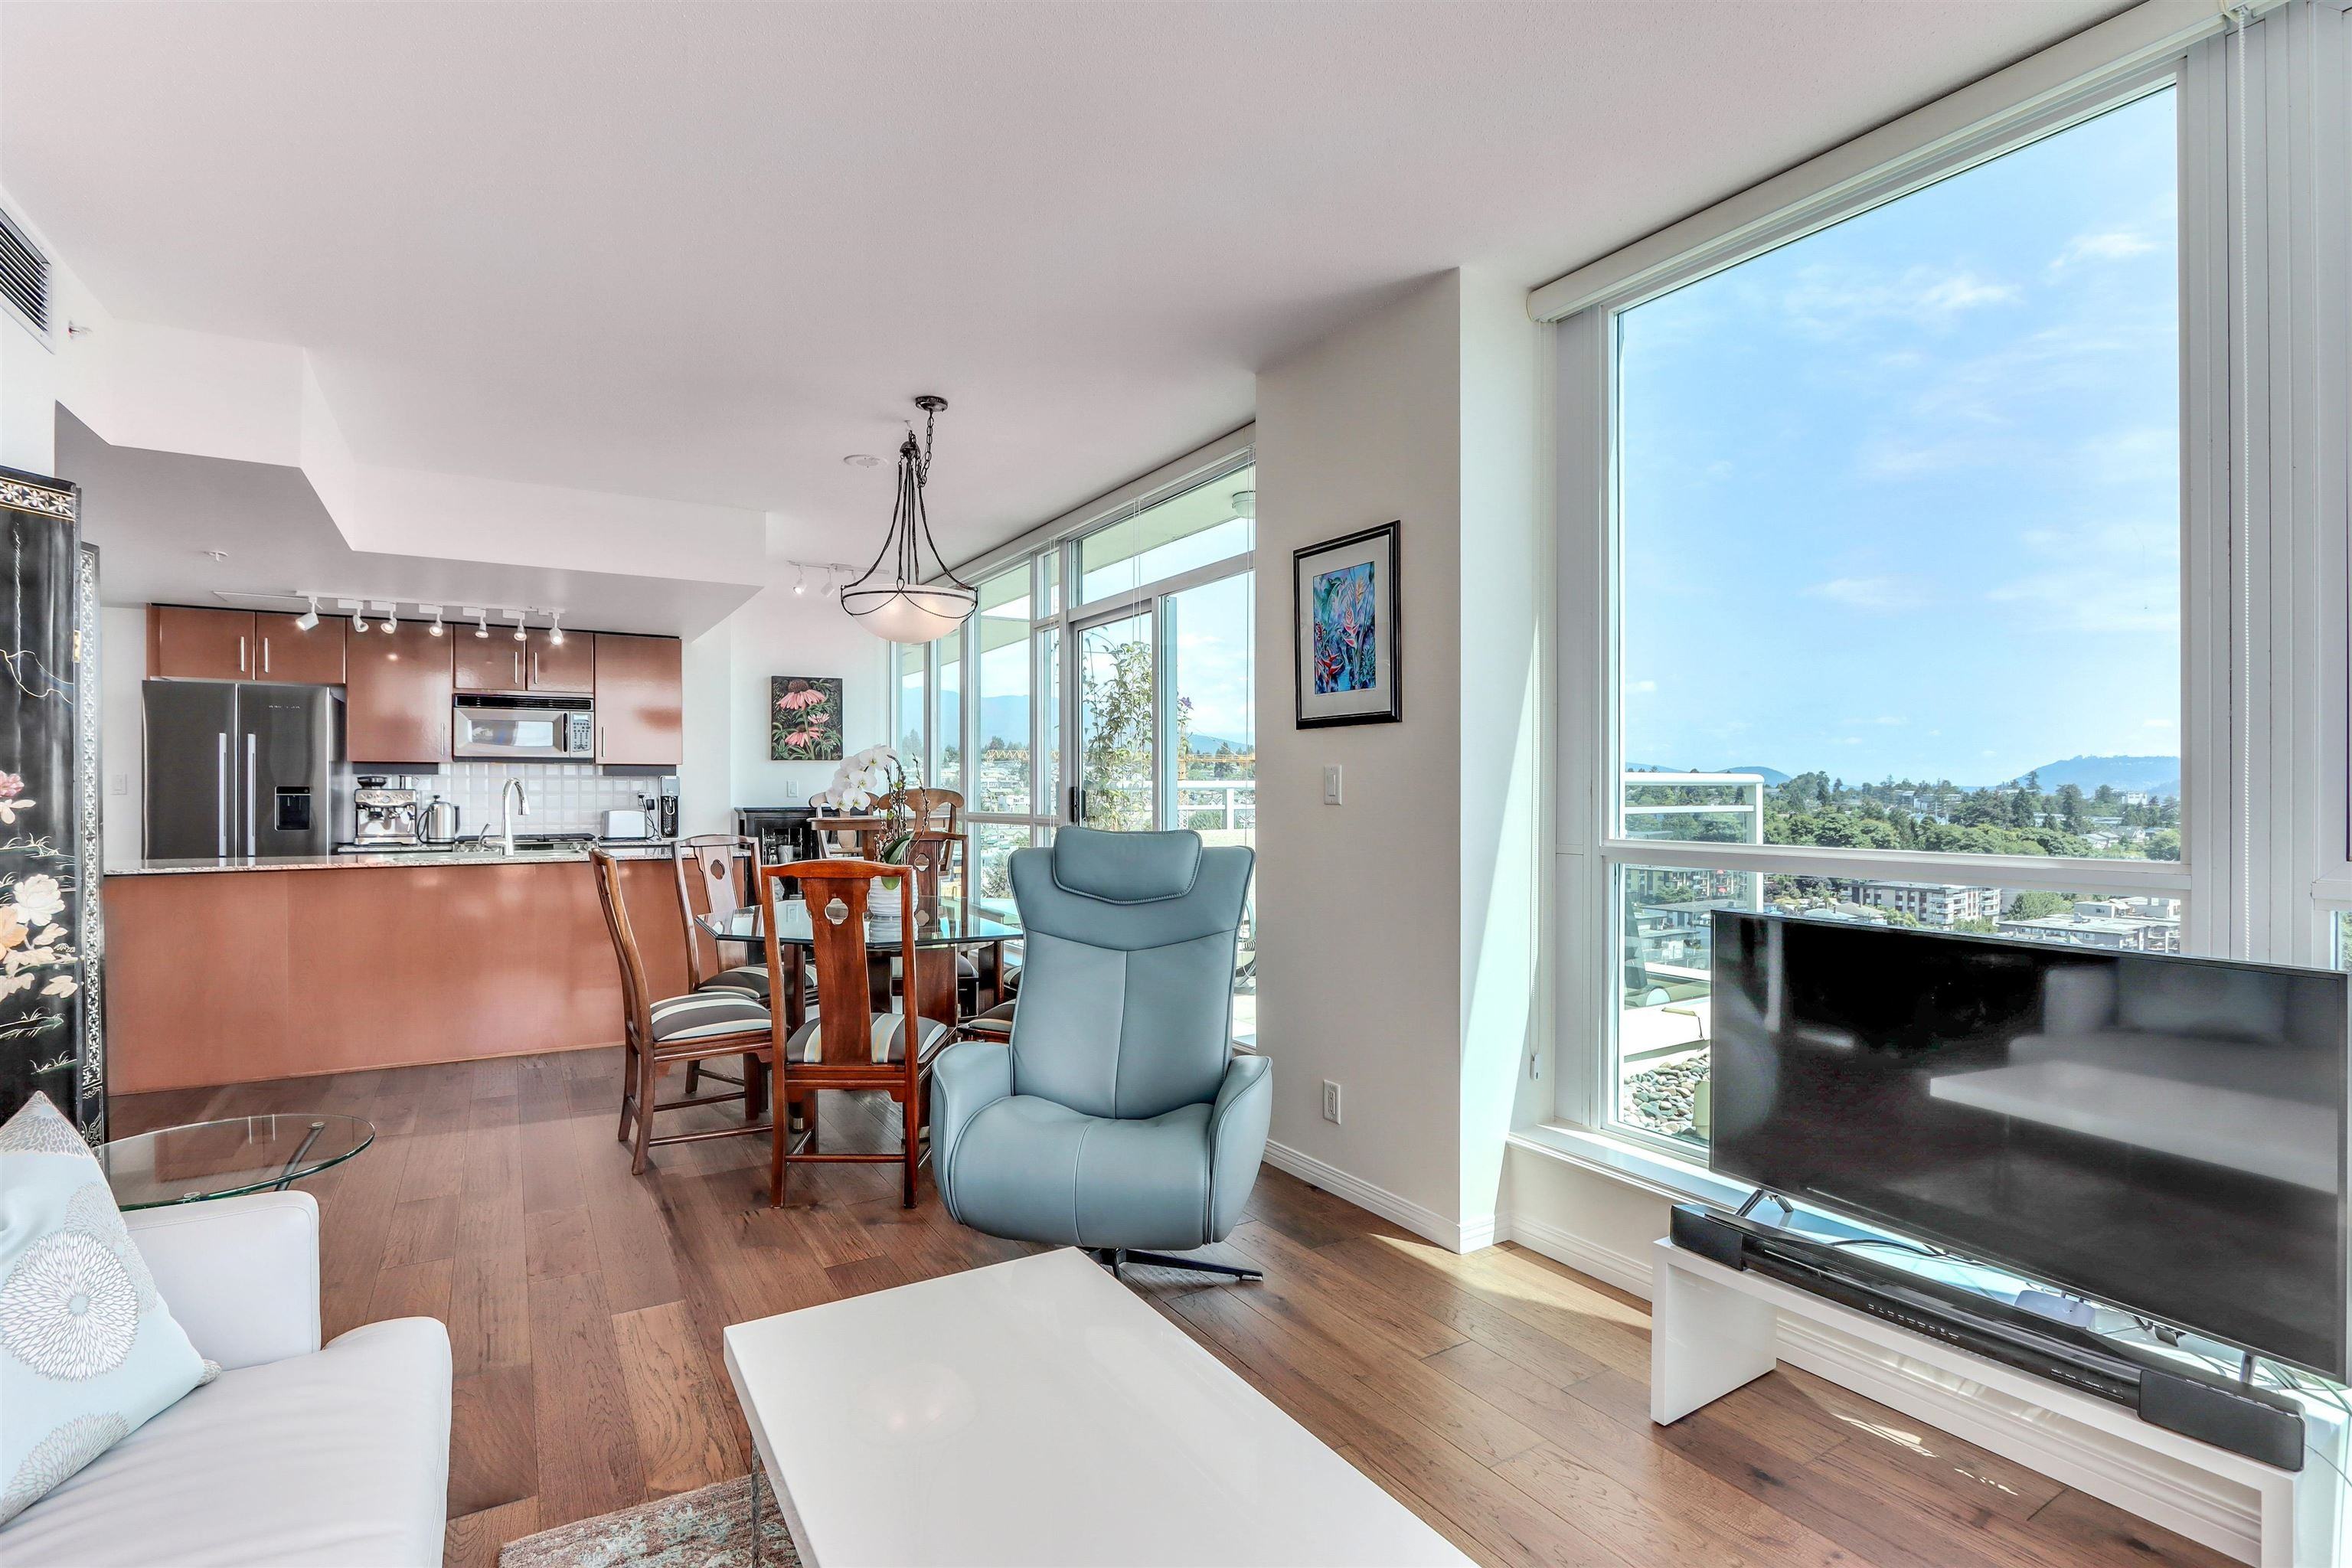 2202 188 E ESPLANADE - Lower Lonsdale Apartment/Condo for sale, 2 Bedrooms (R2618412) - #9